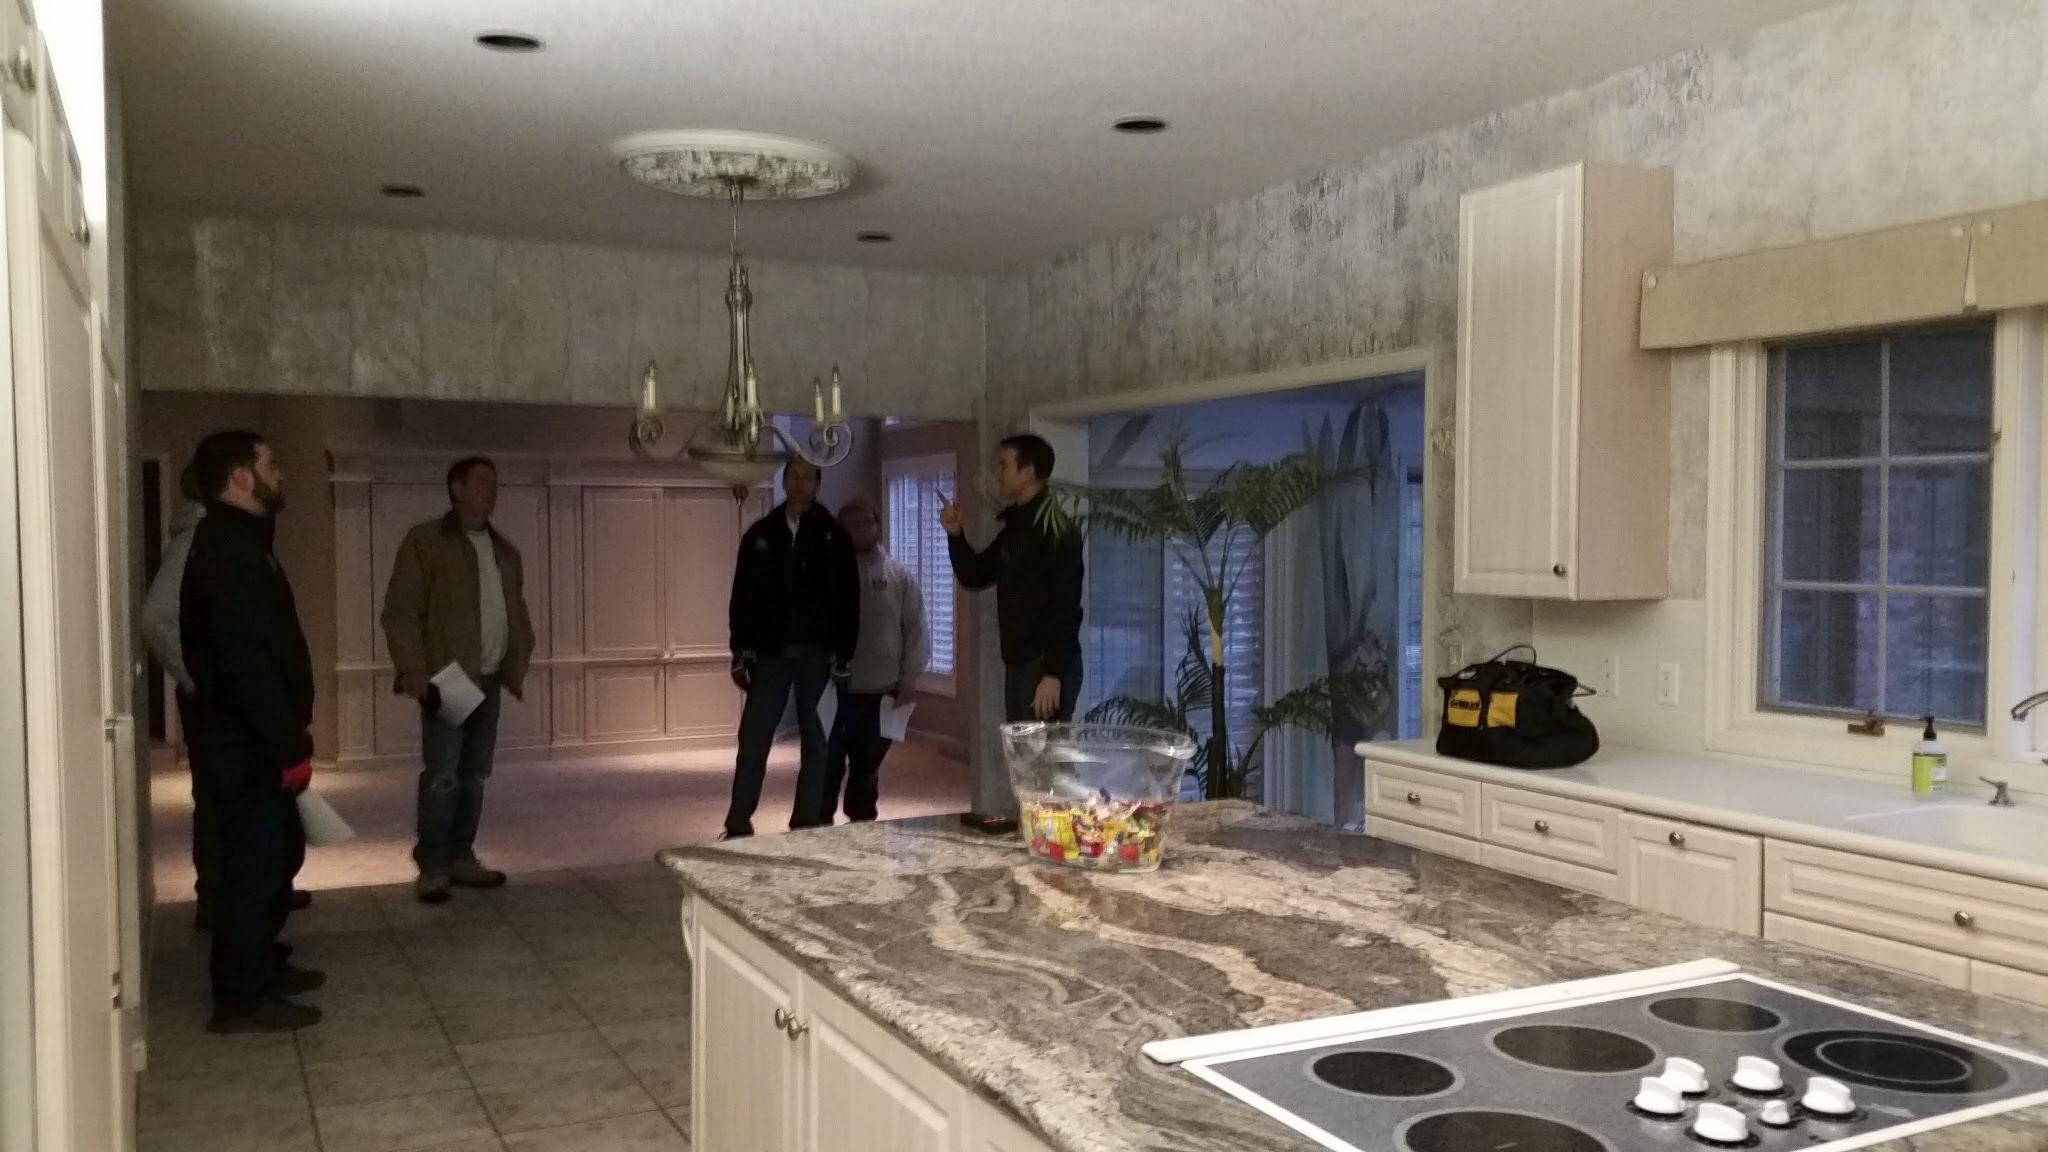 Kitchen before. Discussing demolition plan.